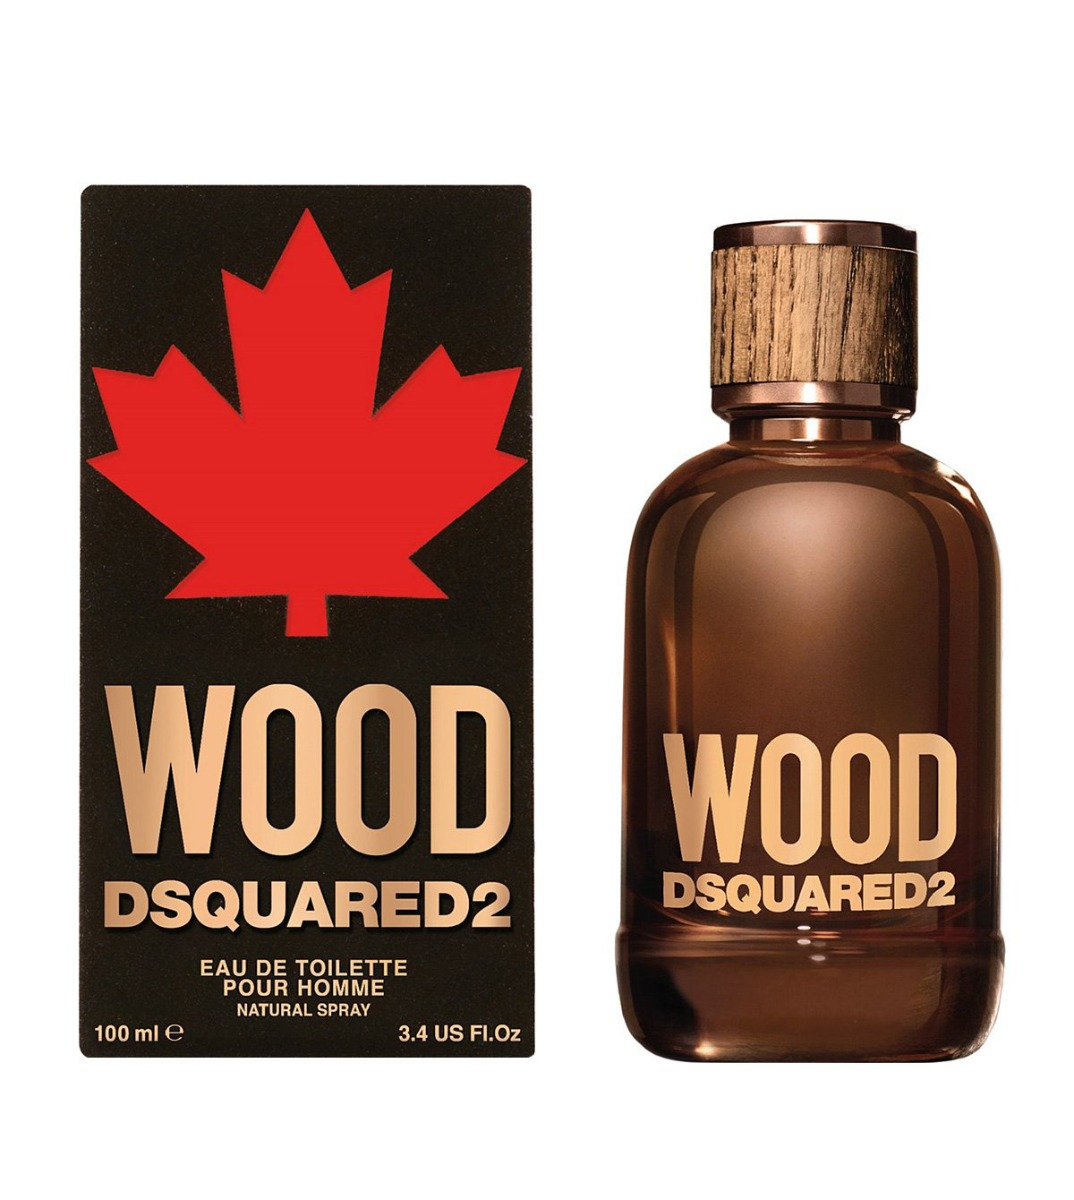 Dsquared2 Wood 100 ml Eau de Toilette Profumo Uomo